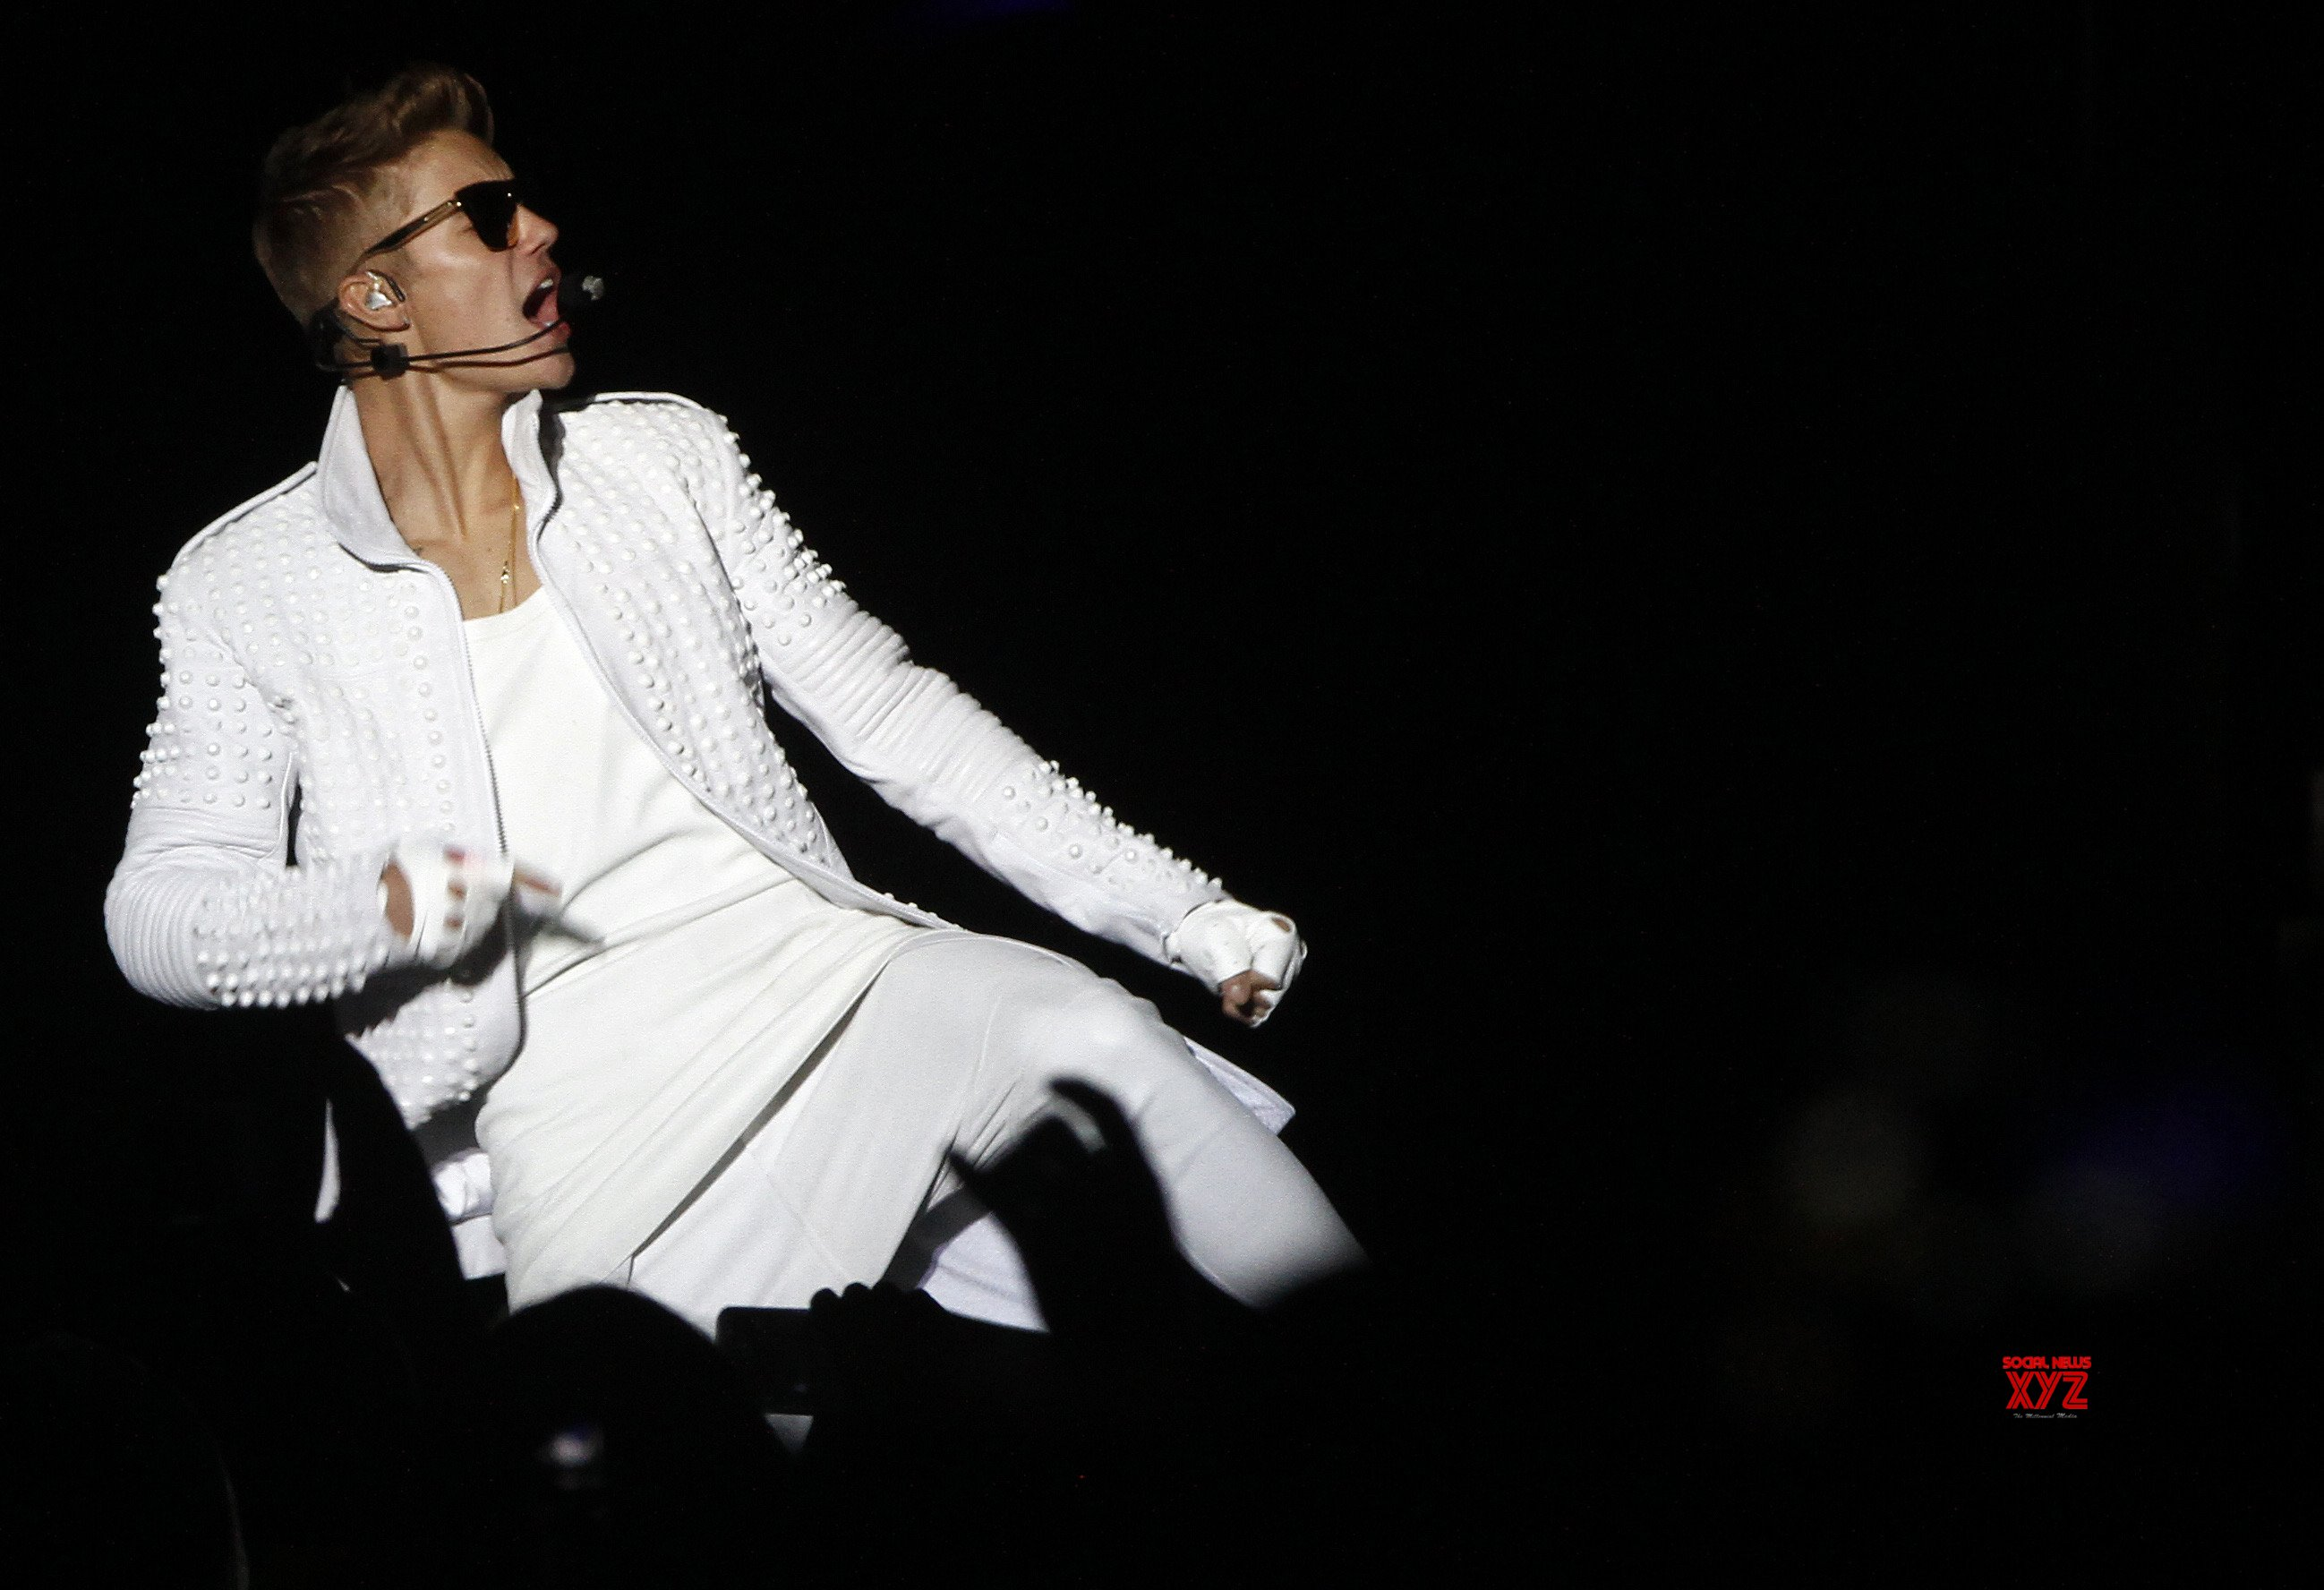 Justin Bieber releases new album 'Changes'